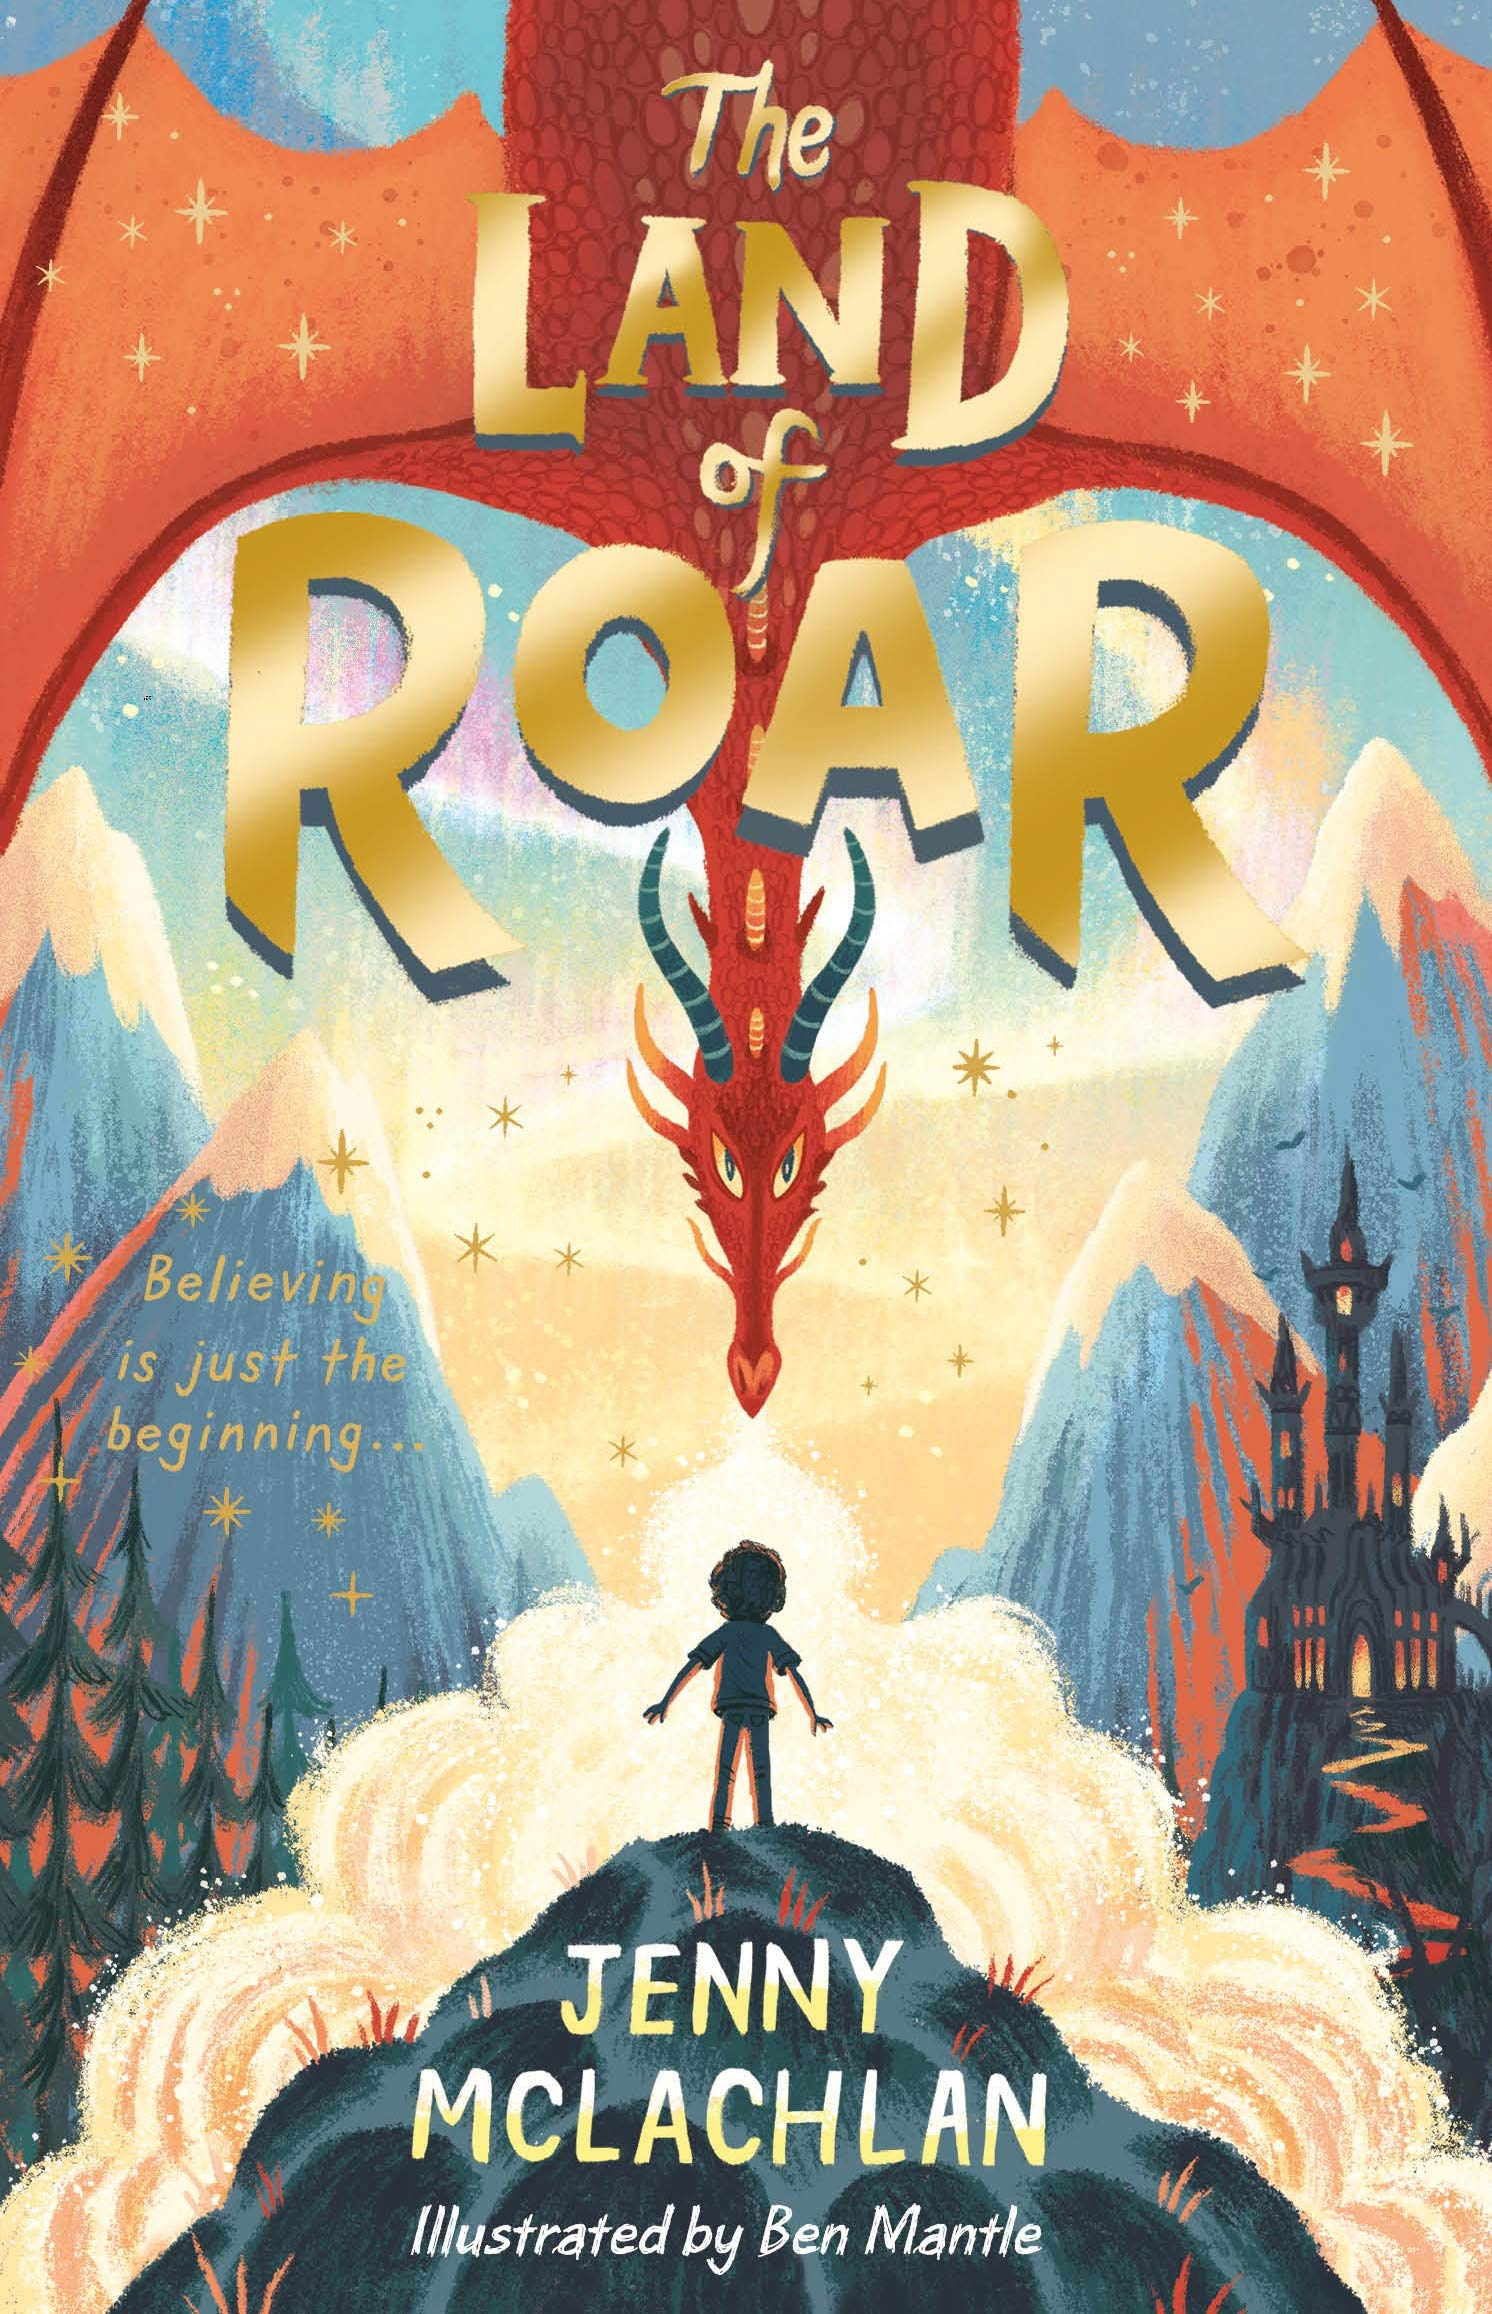 Amazon.com: The Land of Roar (9781405293679): McLachlan, Jenny: Books